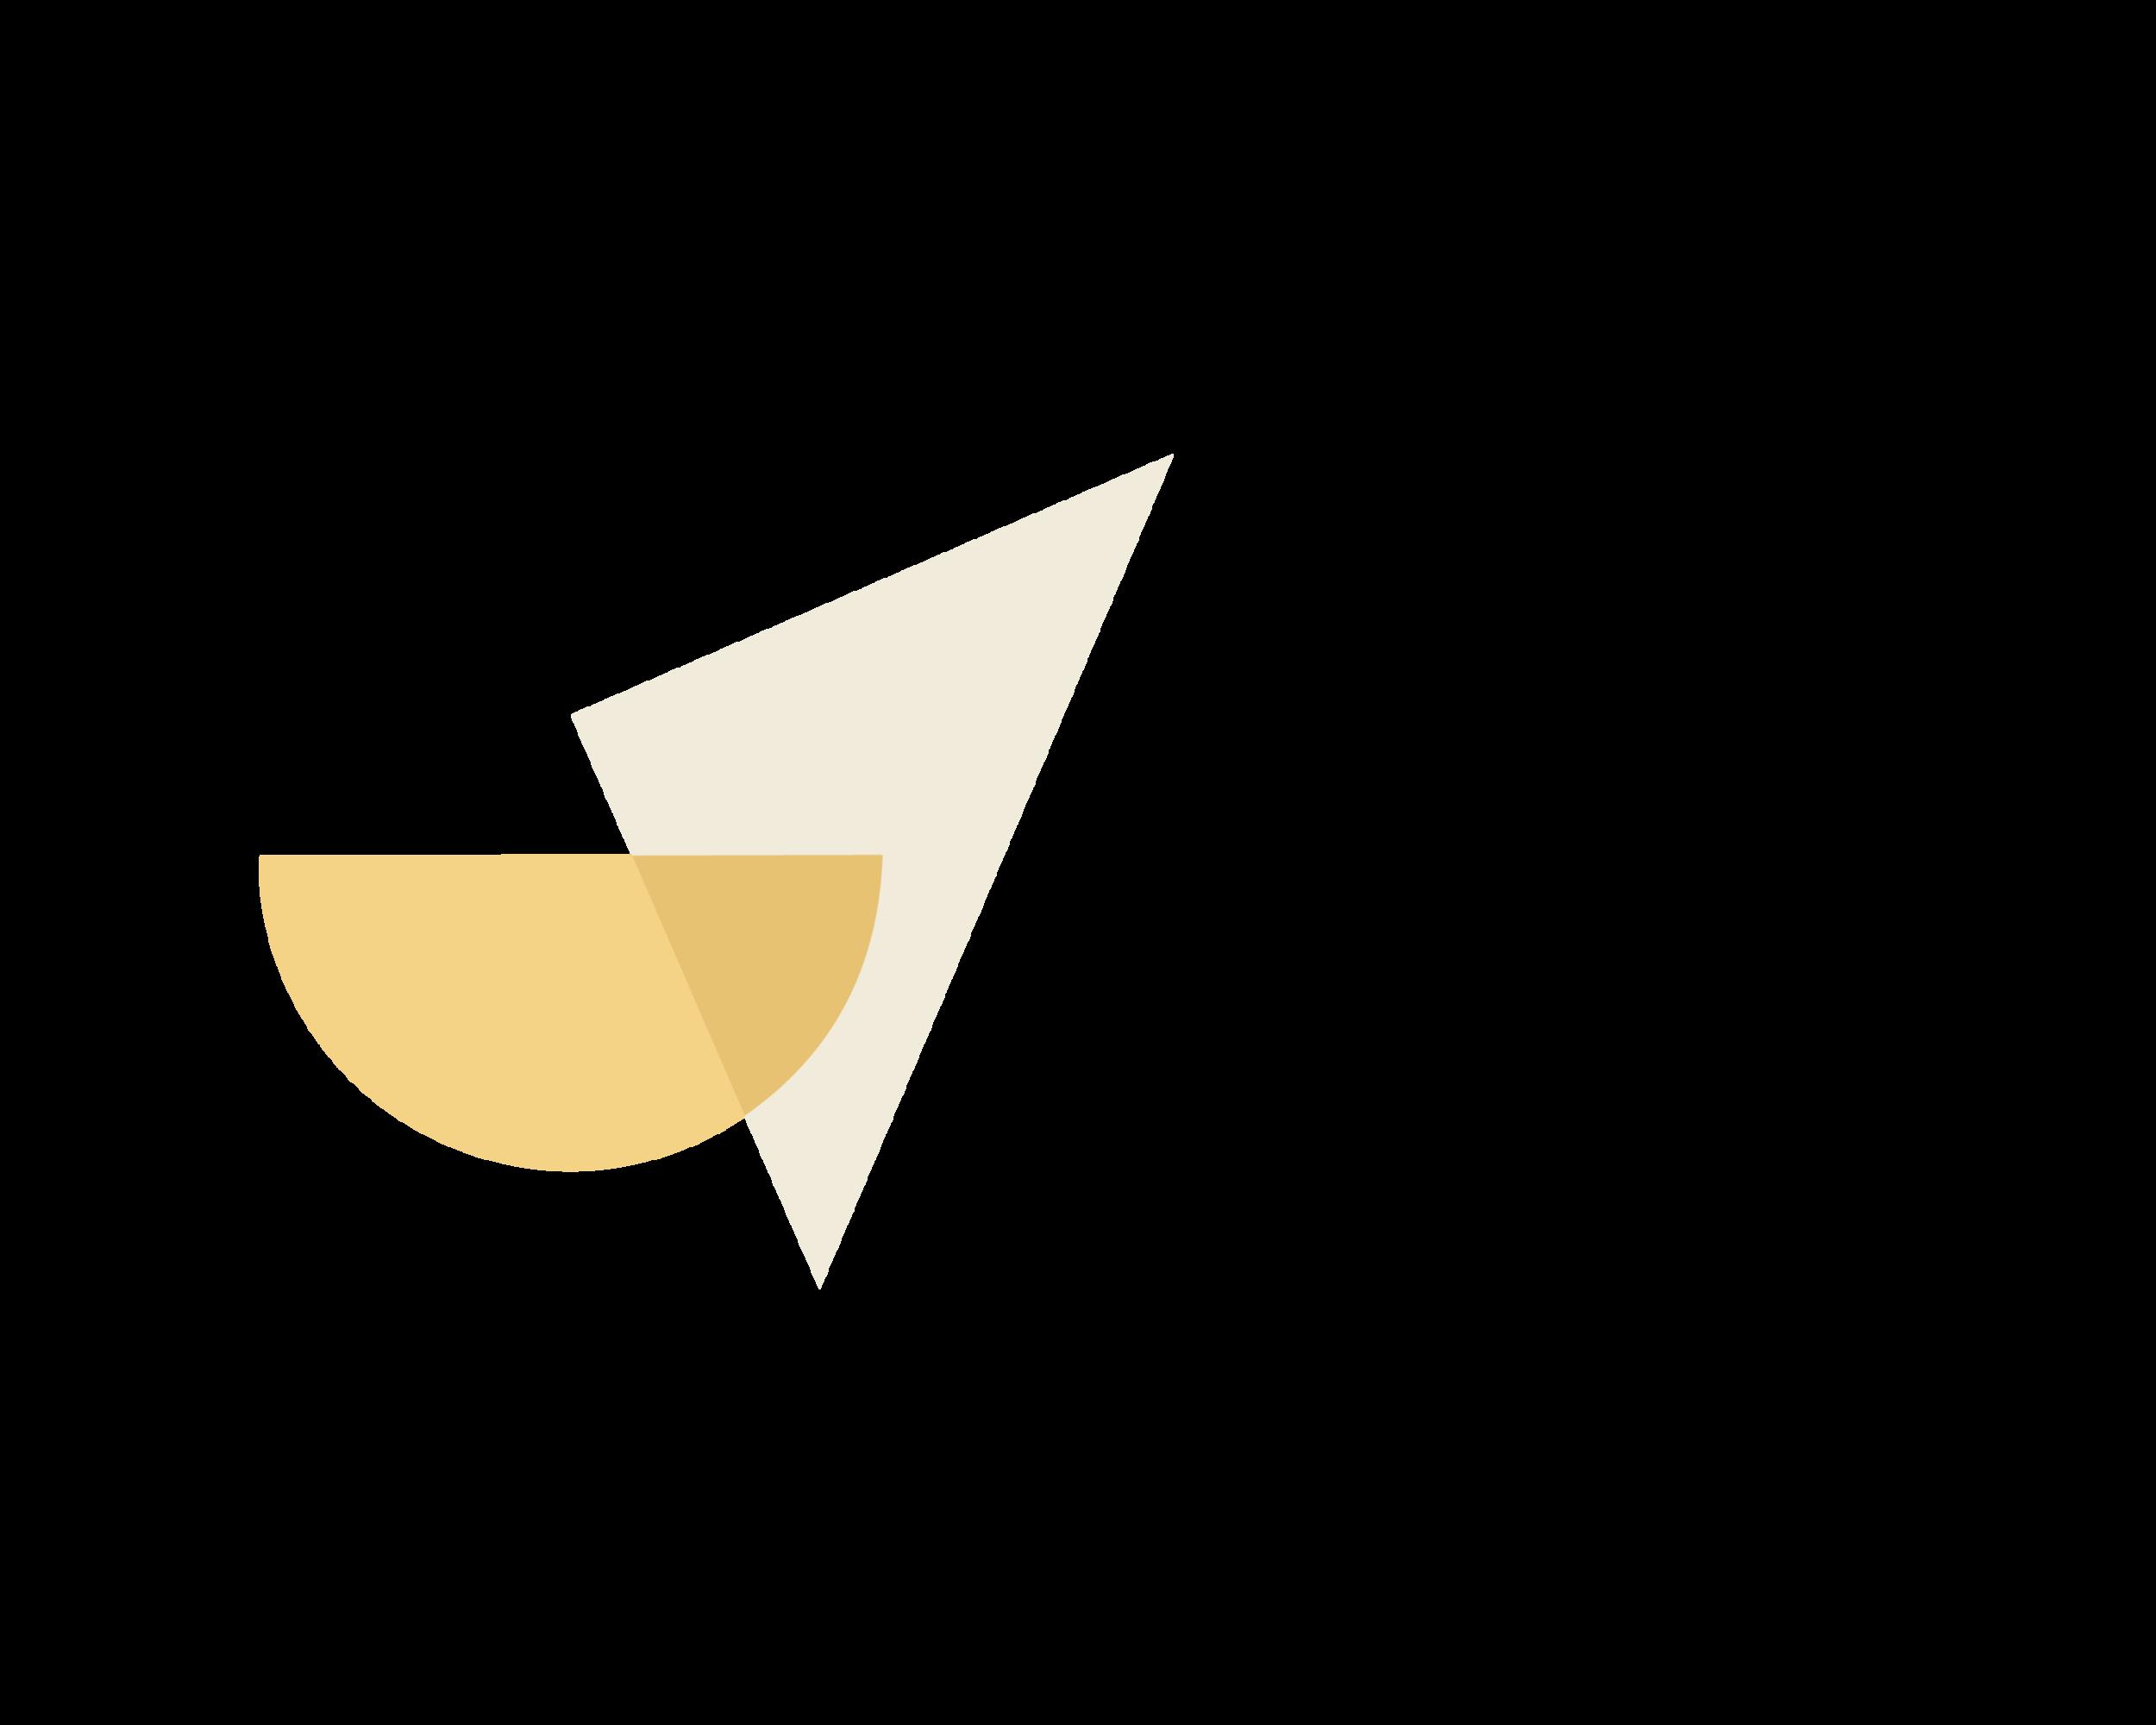 nns_shapes_r1-05.png